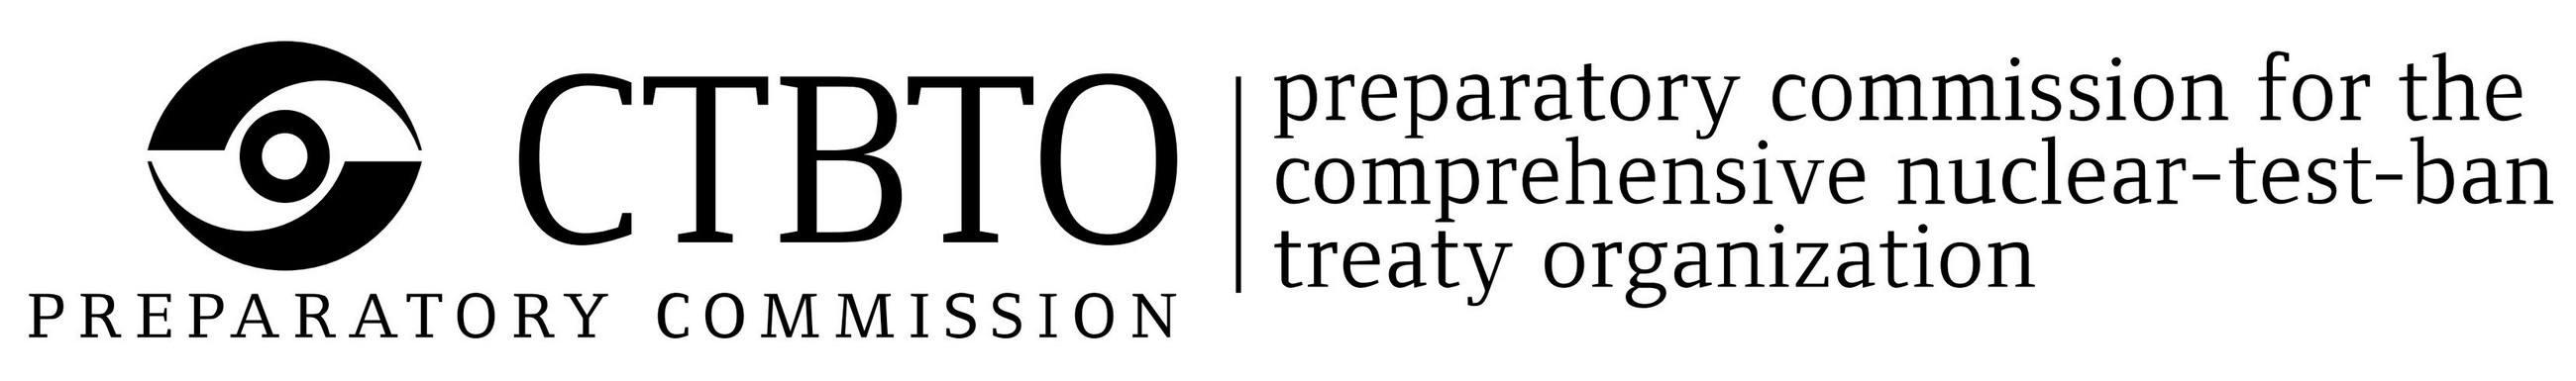 CTBTO   Comprehensive Nuclear Test Ban Treaty Organization Logo png